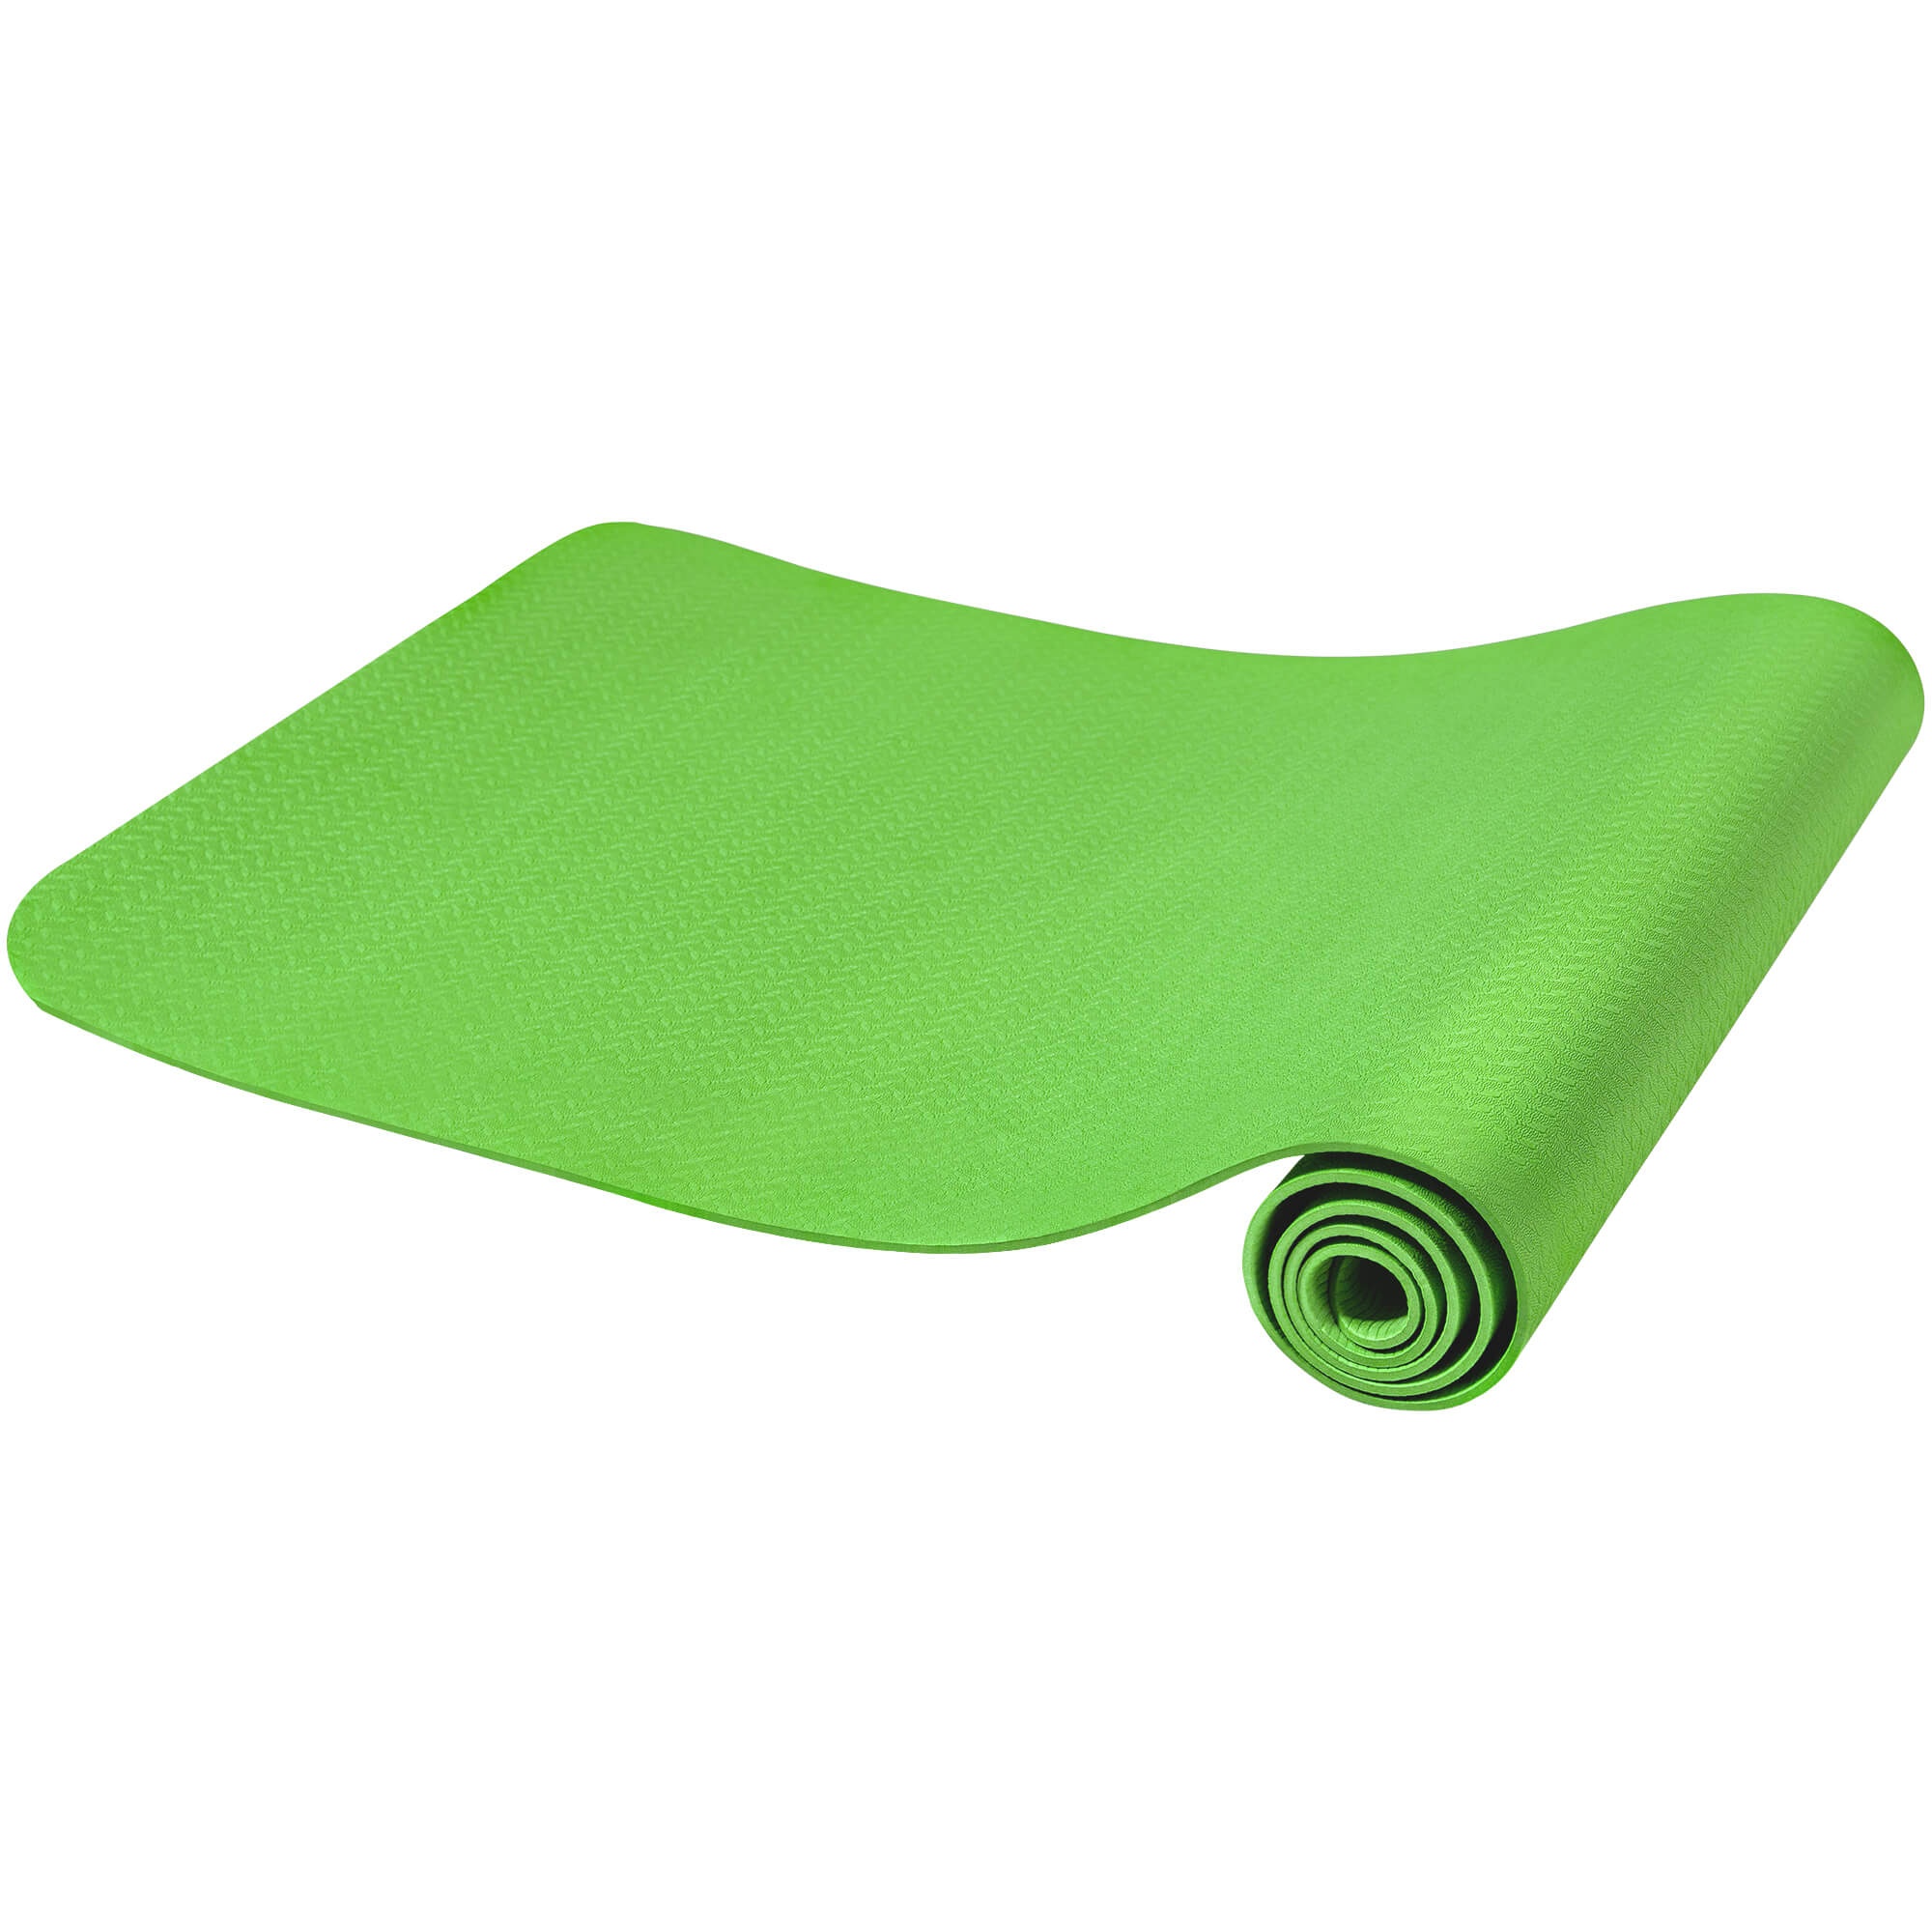 Gorilla Sports Yogamatte Dünn Limegreen 10 mm 100815-00035-0072